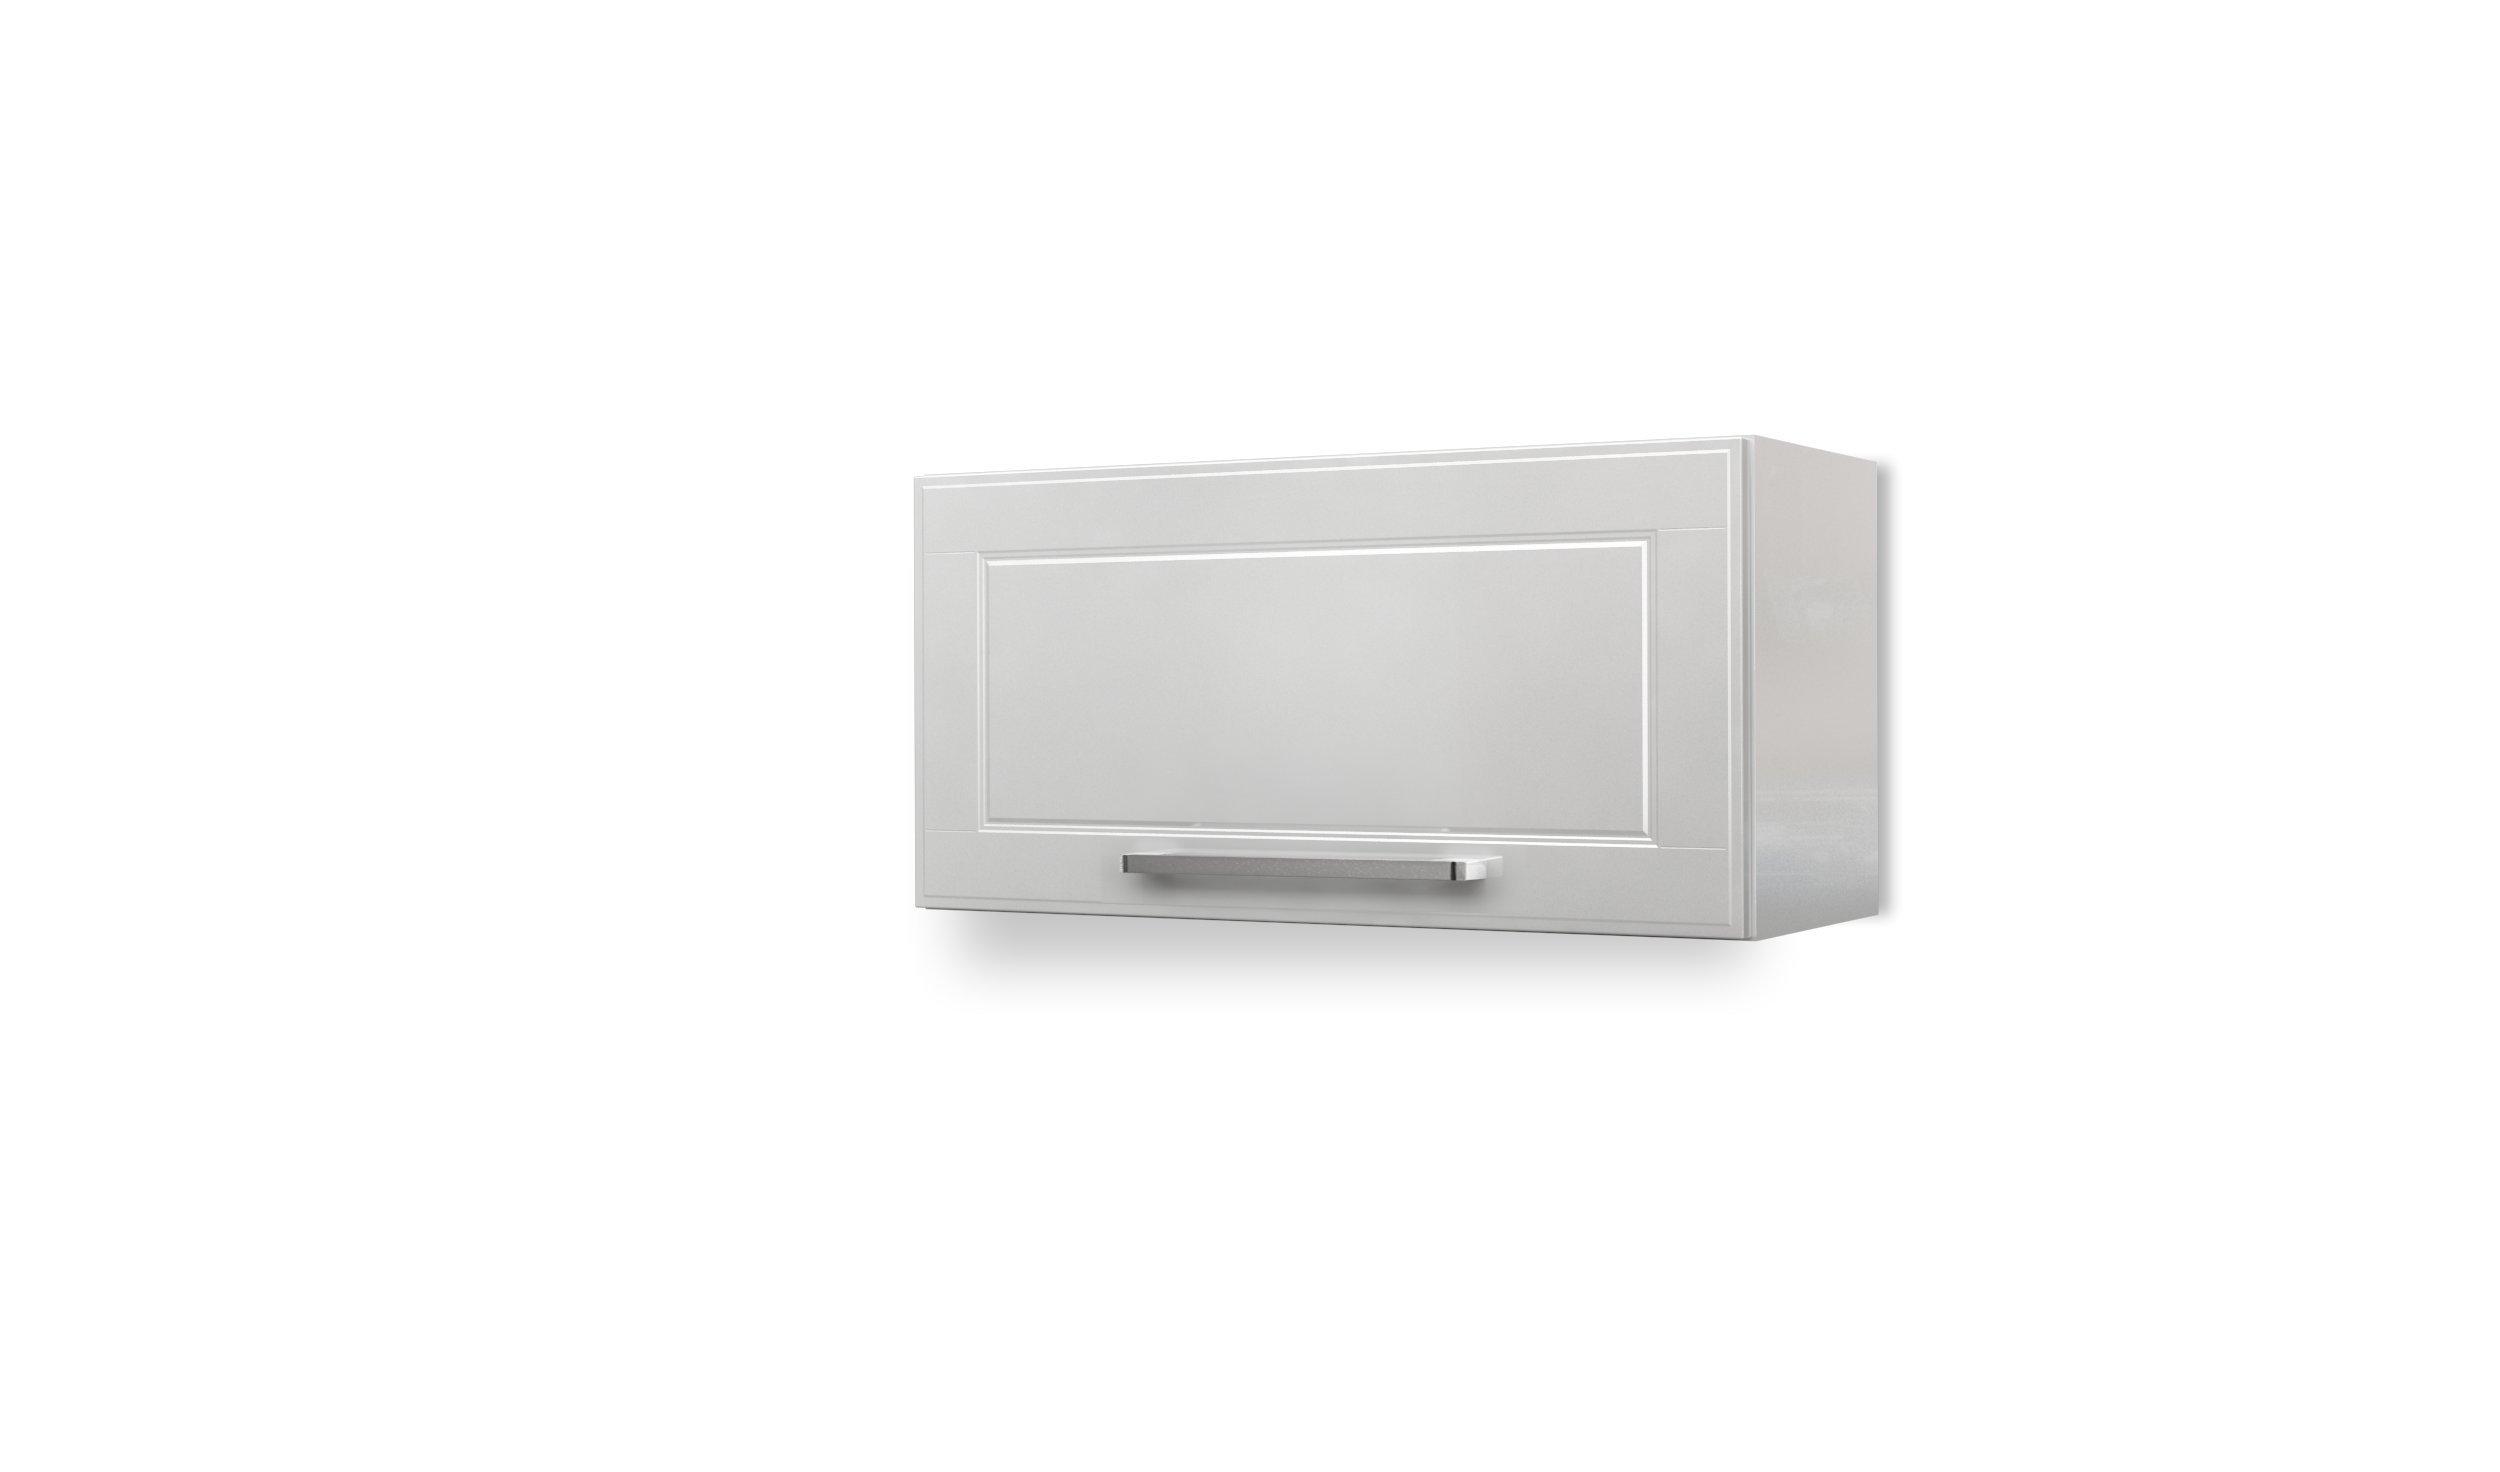 BSK Wall Steel Kitchen Cabinet 1 Hydraulic Door 27'' W x 14'' H, (White)